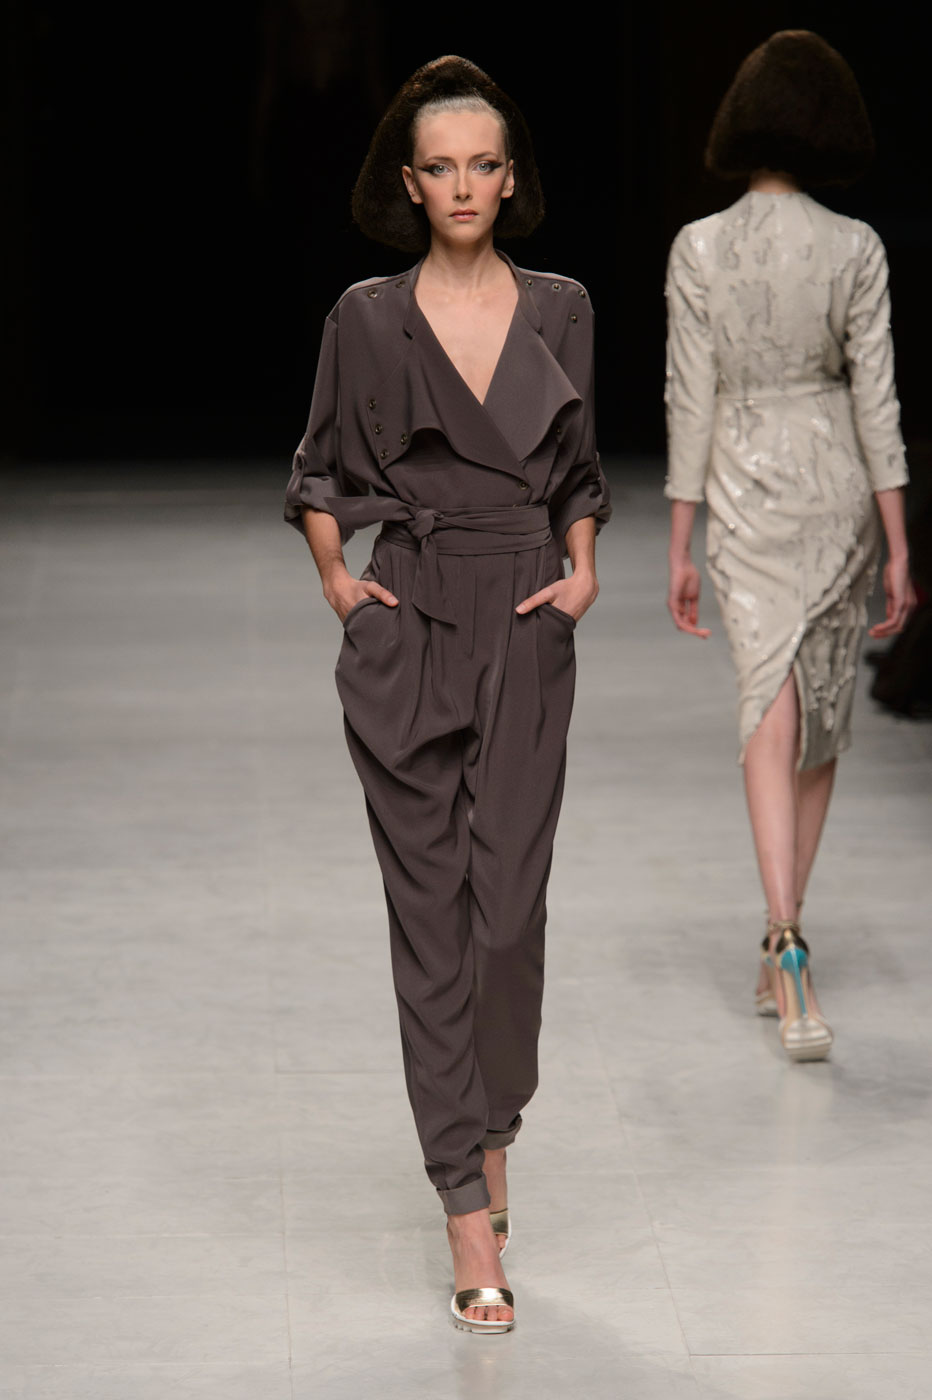 Julien-Fournie-Prive-fashion-runway-show-haute-couture-paris-spring-2015-the-impression-04